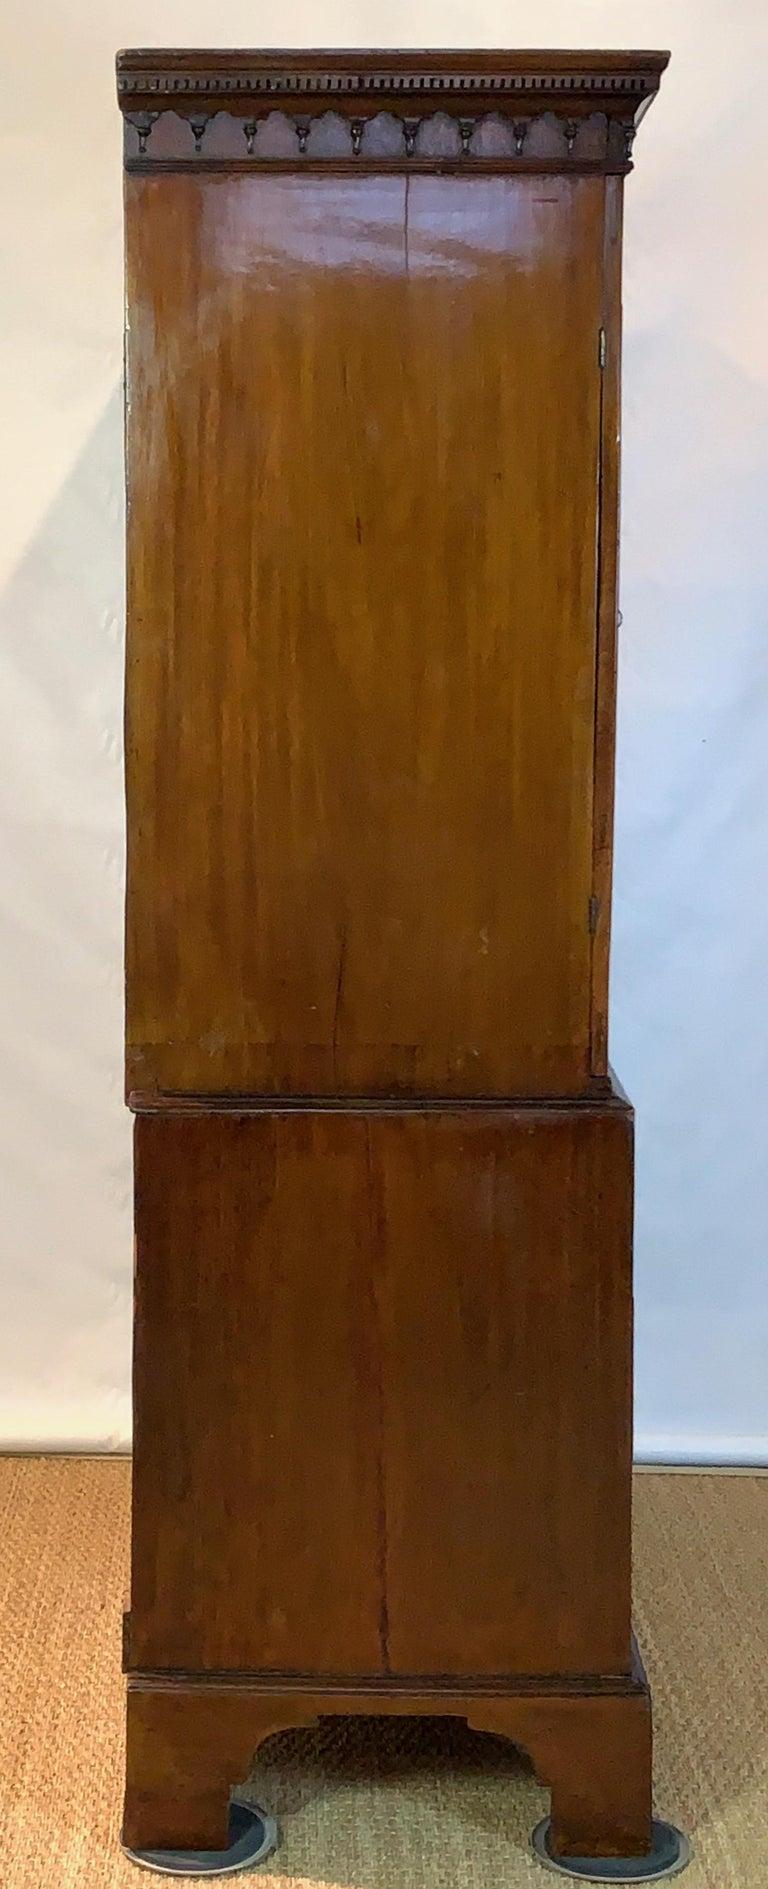 Early 19th Century English Mahogany Linen Press For Sale 2